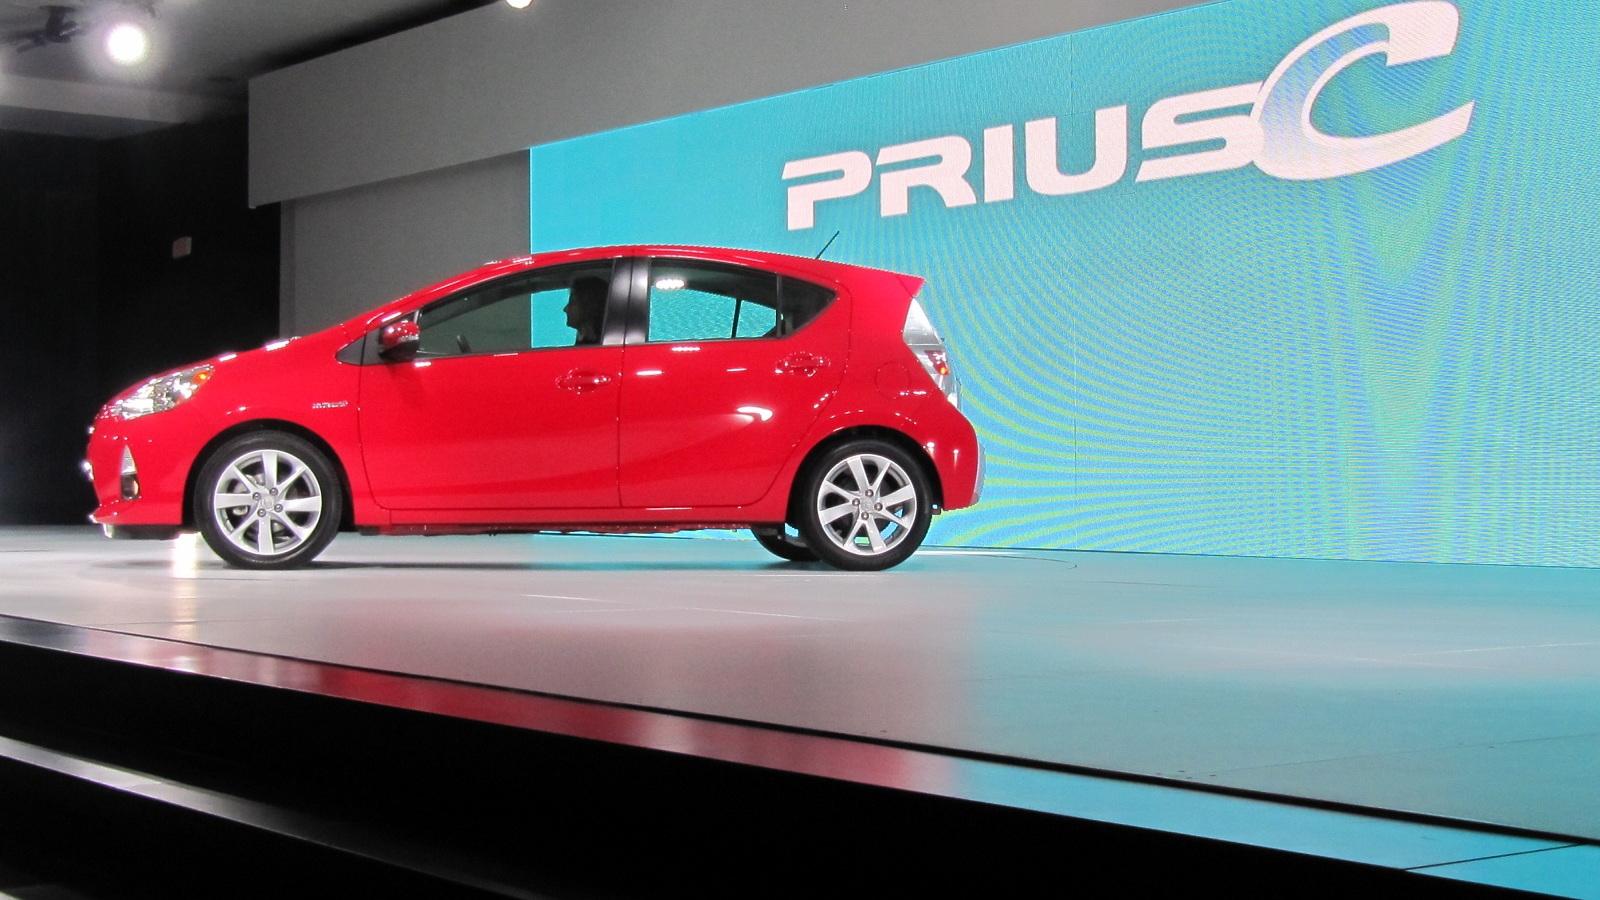 2012 Toyota Prius C launch, Detroit Auto Show